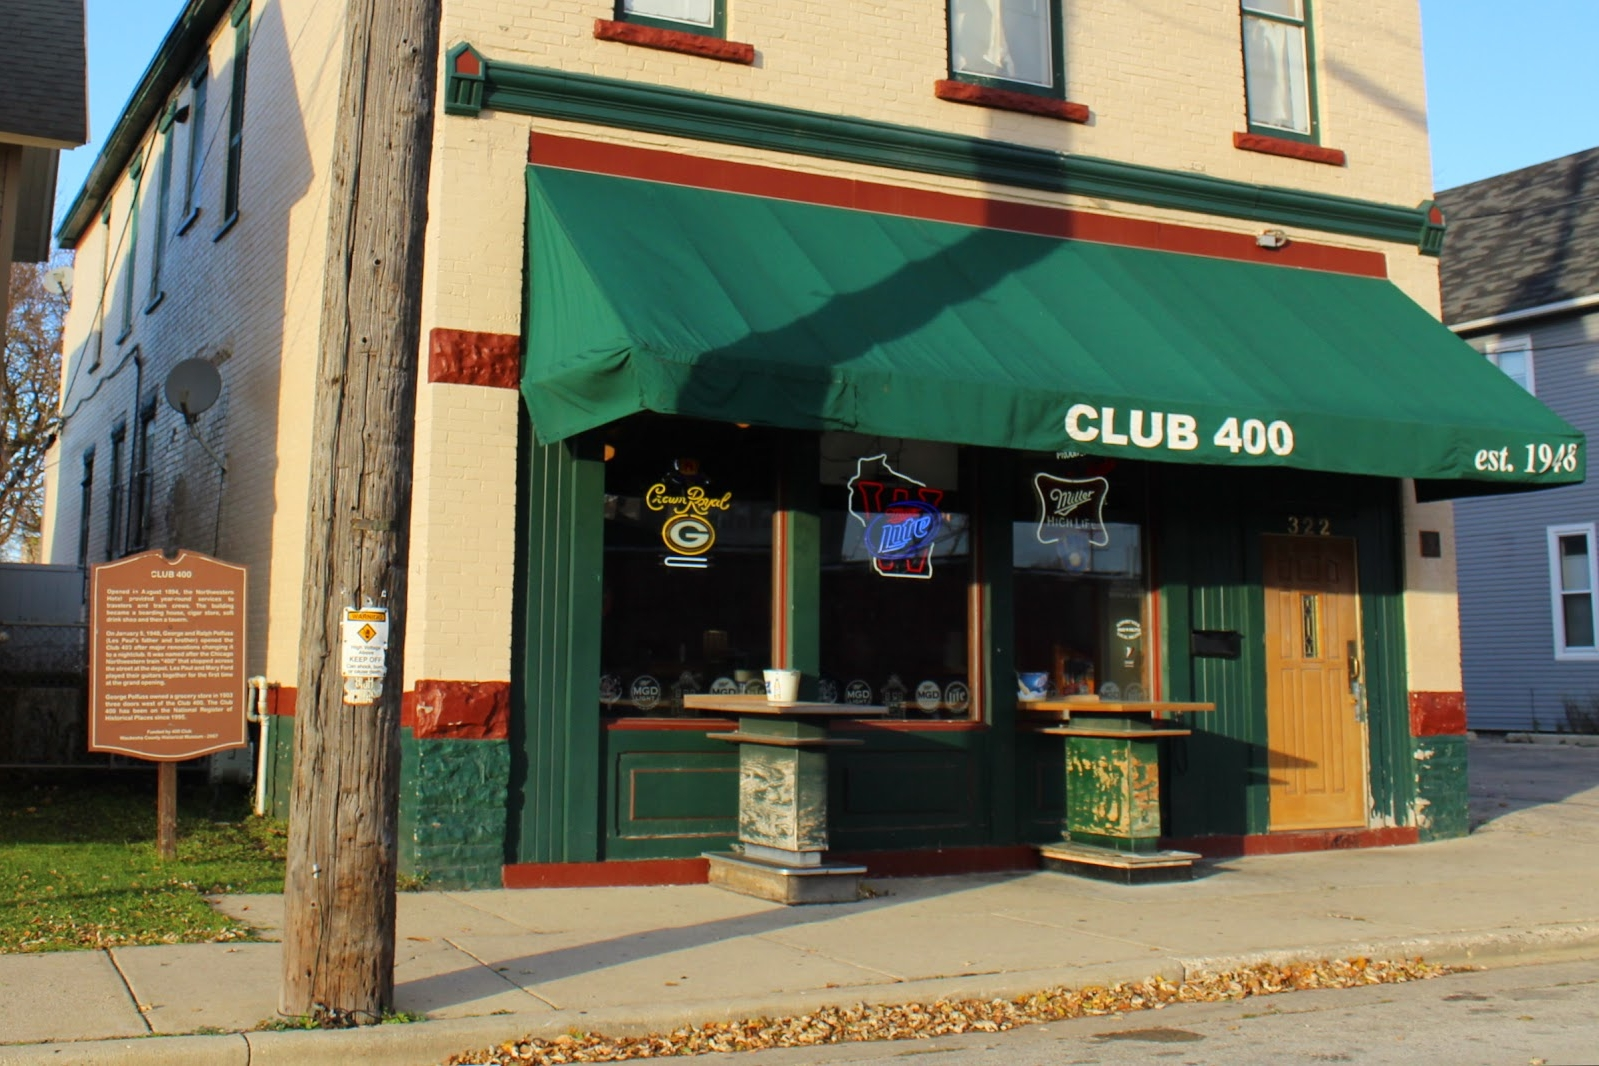 Club 400 exterior today.